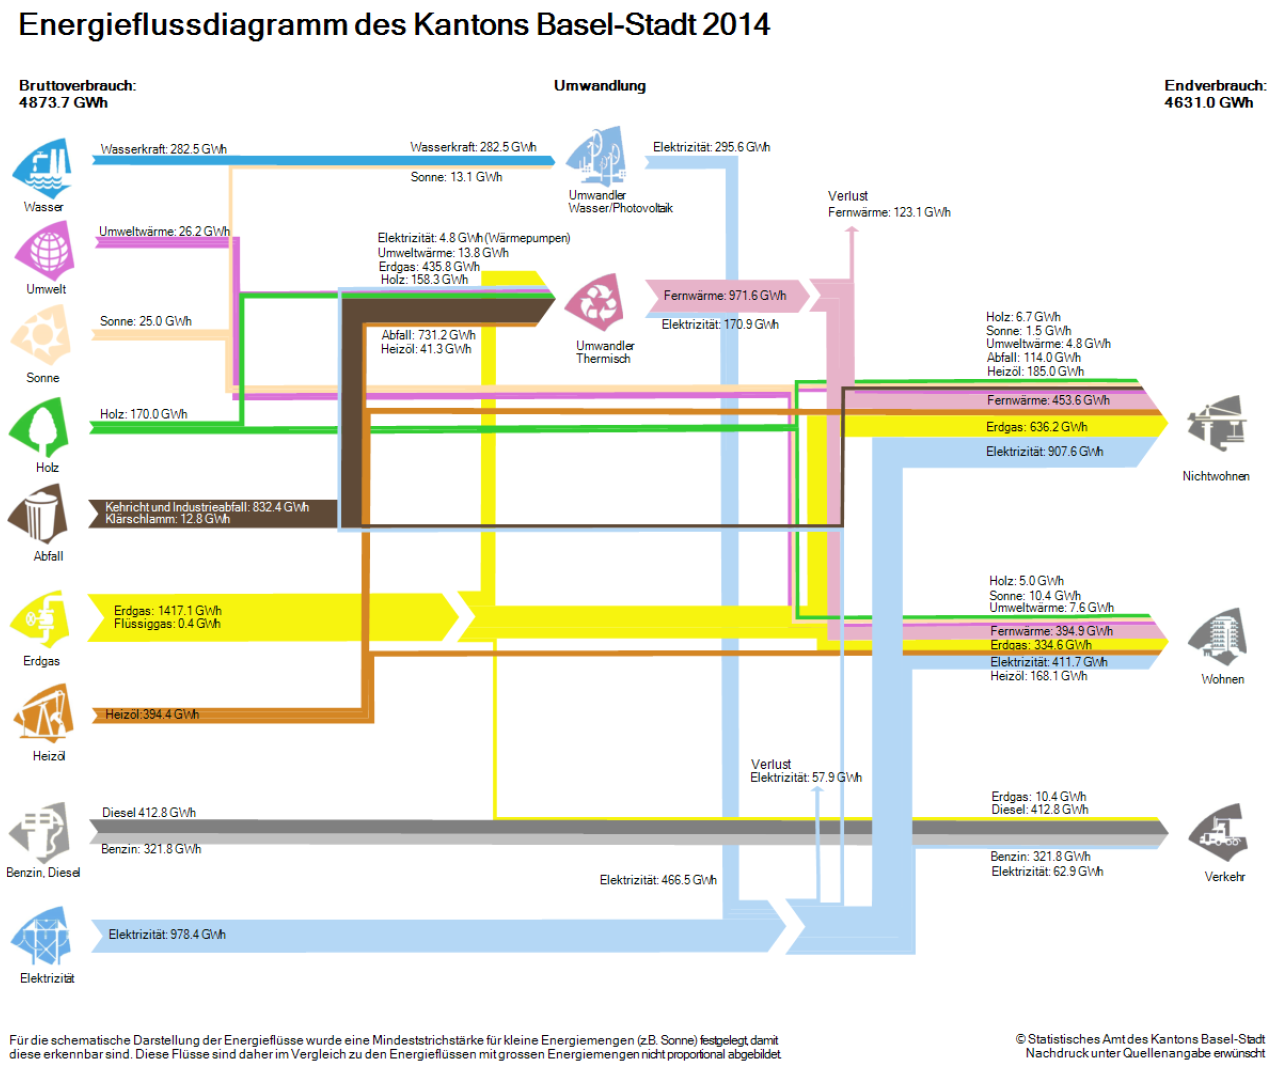 energy_flow_kanton_baselstadt_2014